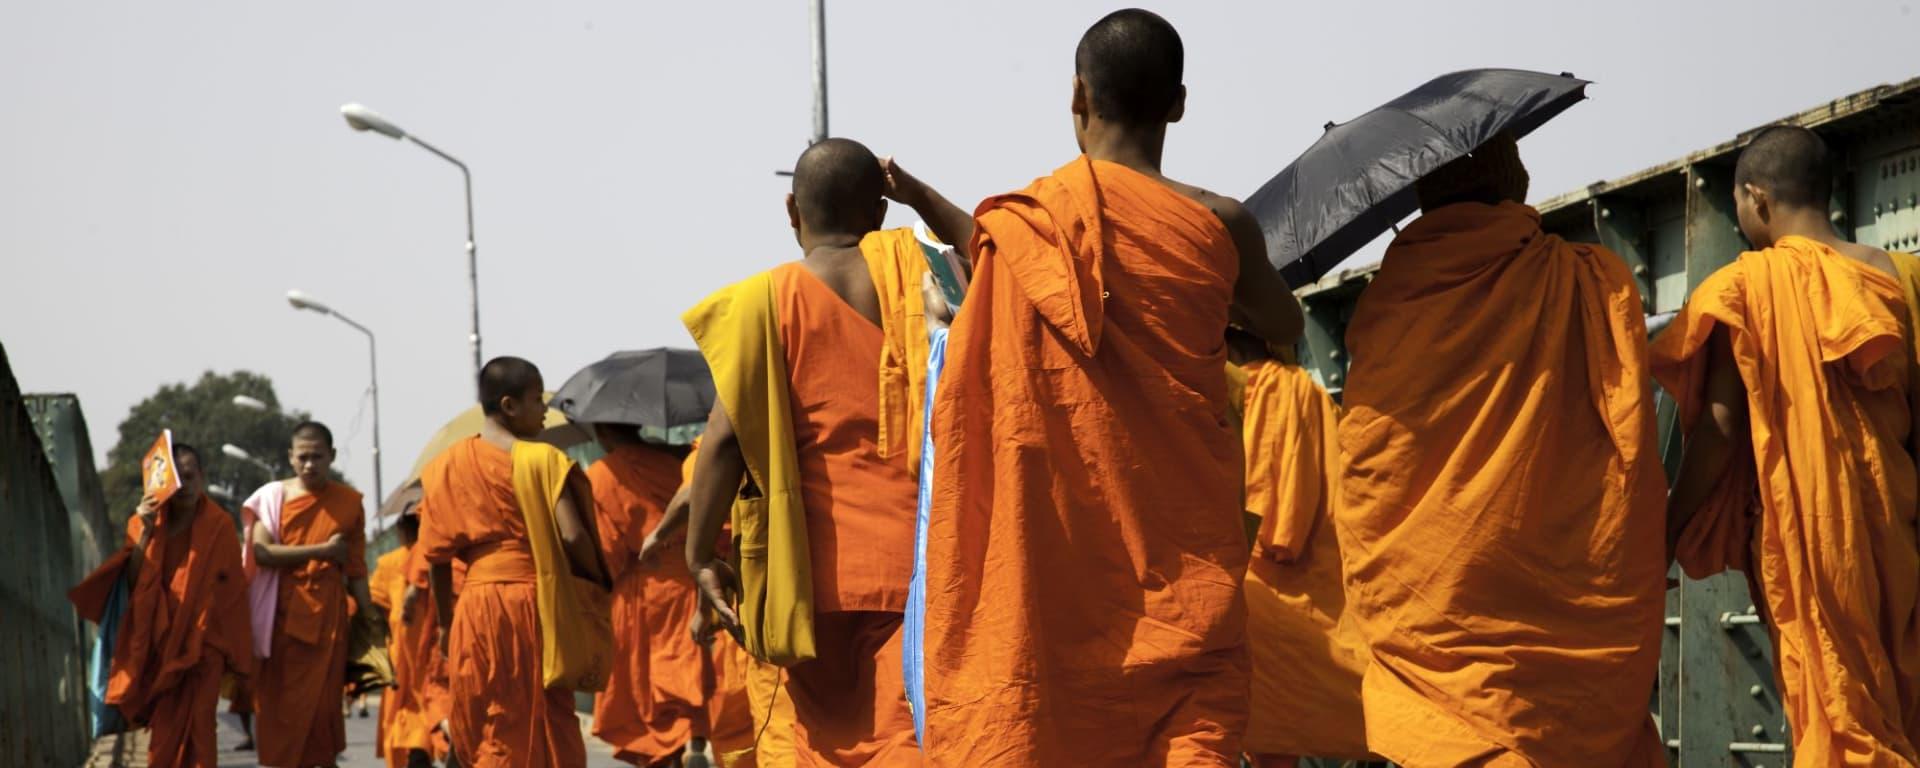 Stadtrundfahrt Luang Prabang: Monks